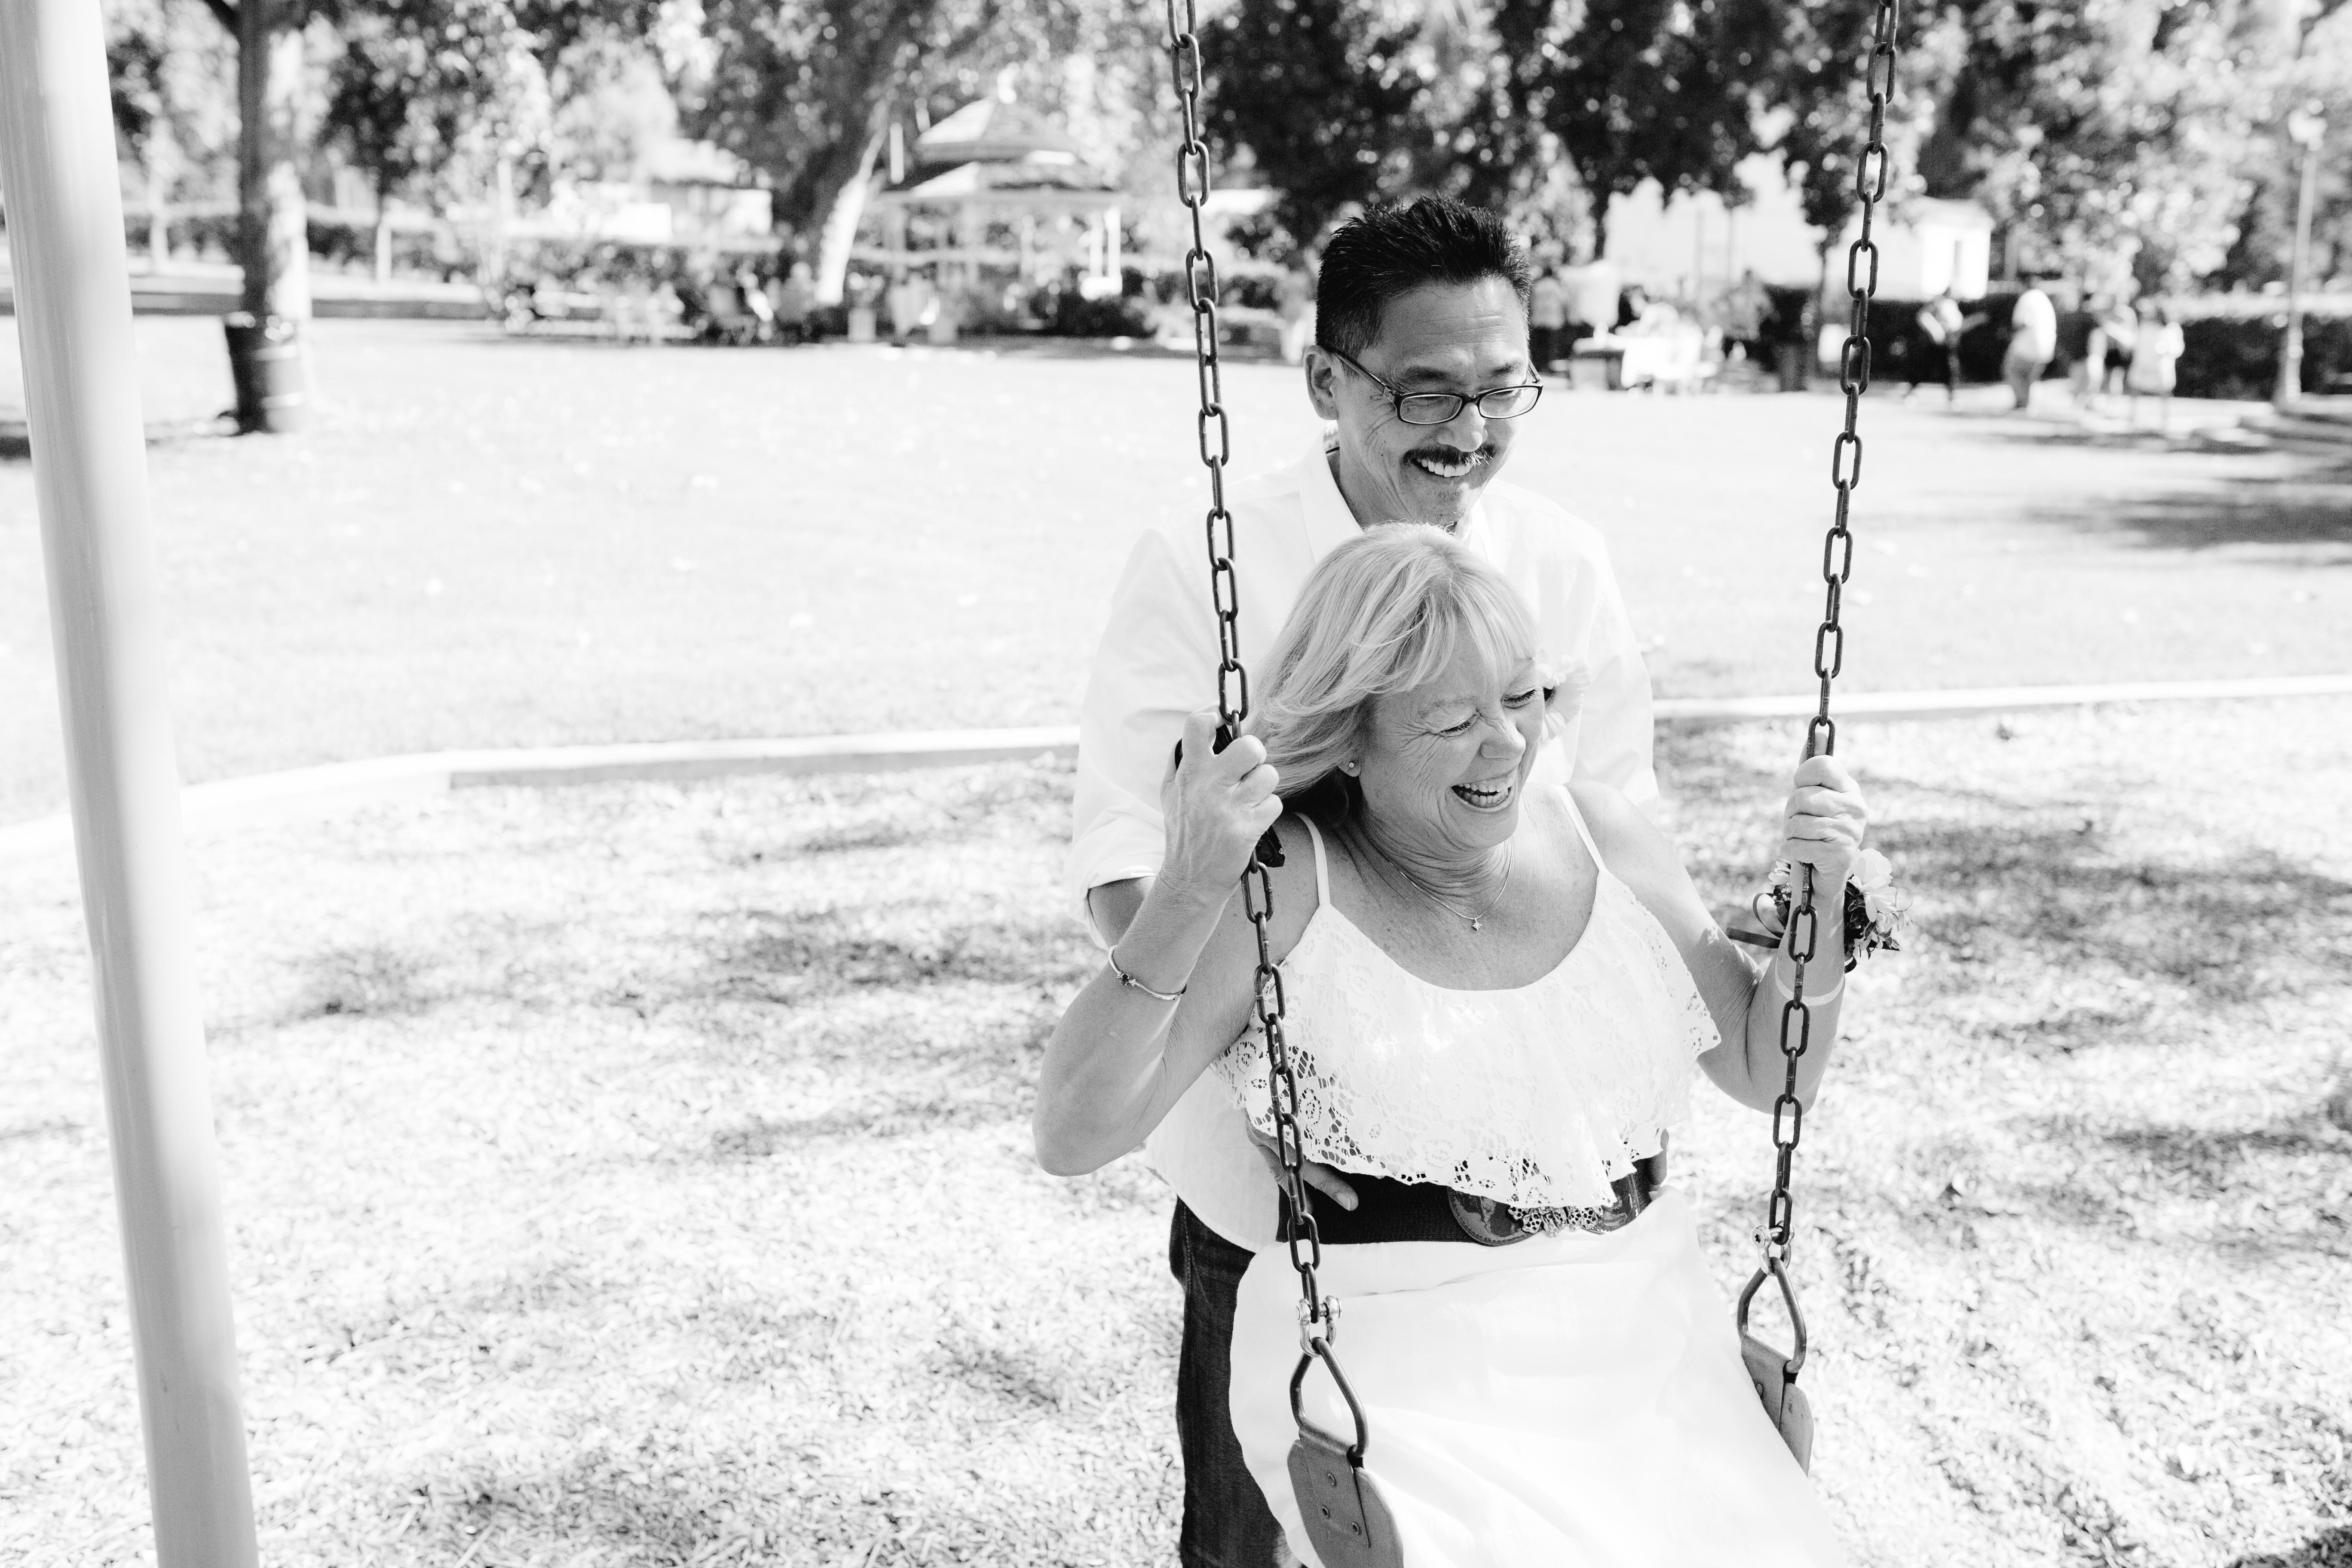 Swinging at their wedding. So sweet. (Alysa Bajenaru Photography)